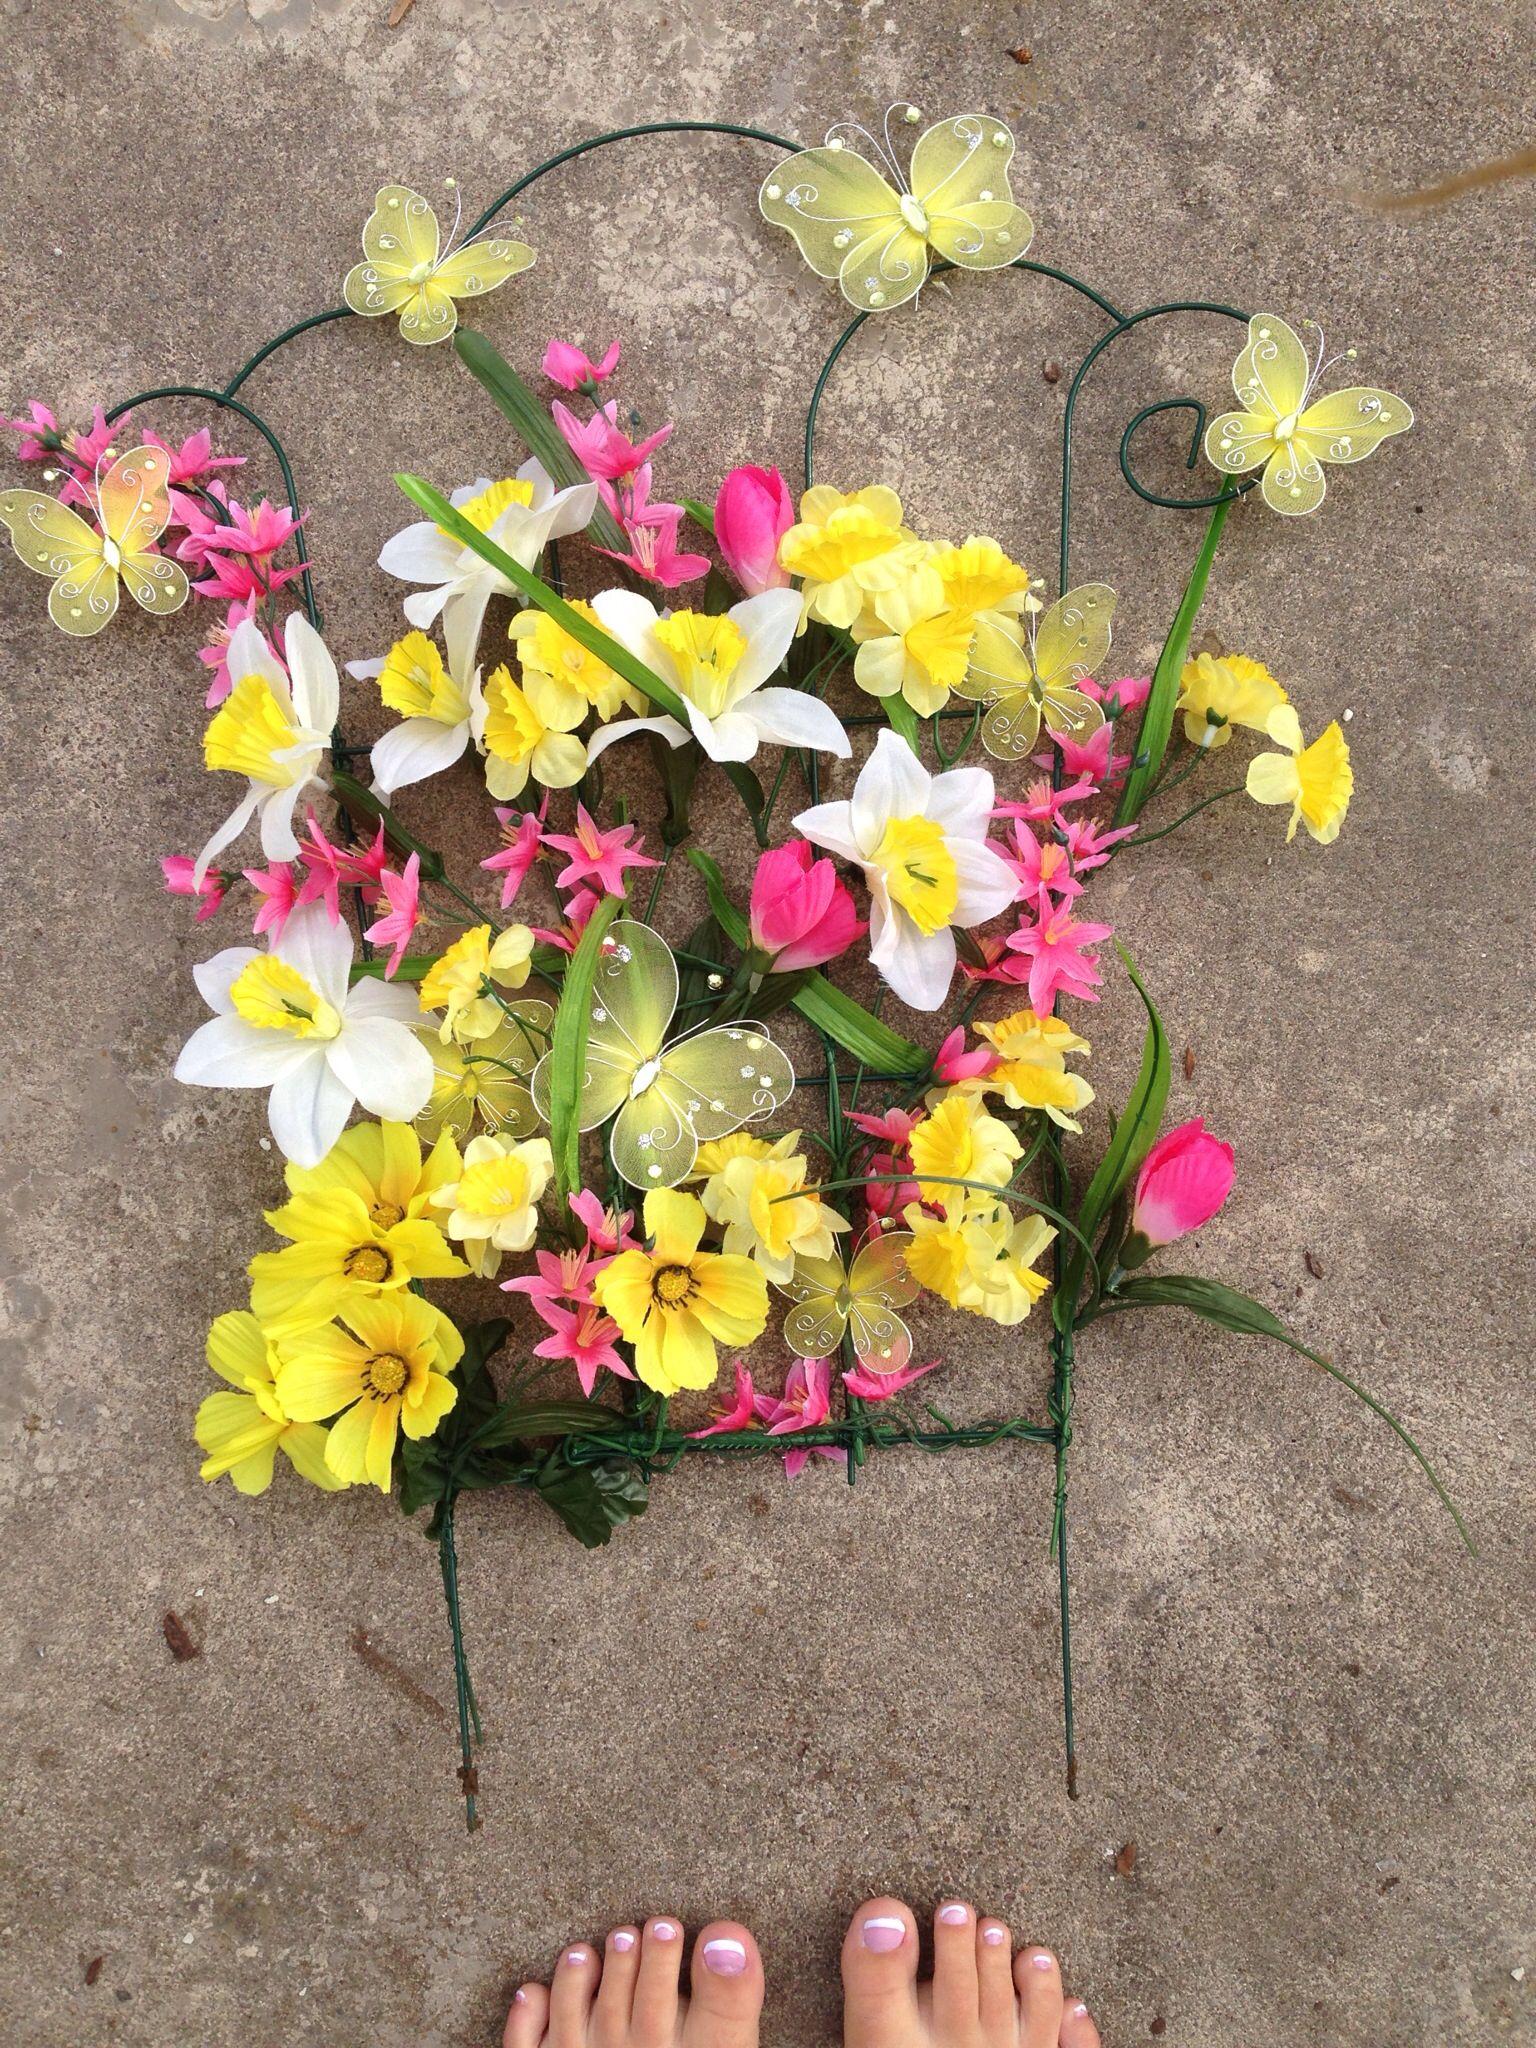 Garden Flower Diy Fake Flowers For My Boyfriends Grandmas Grave